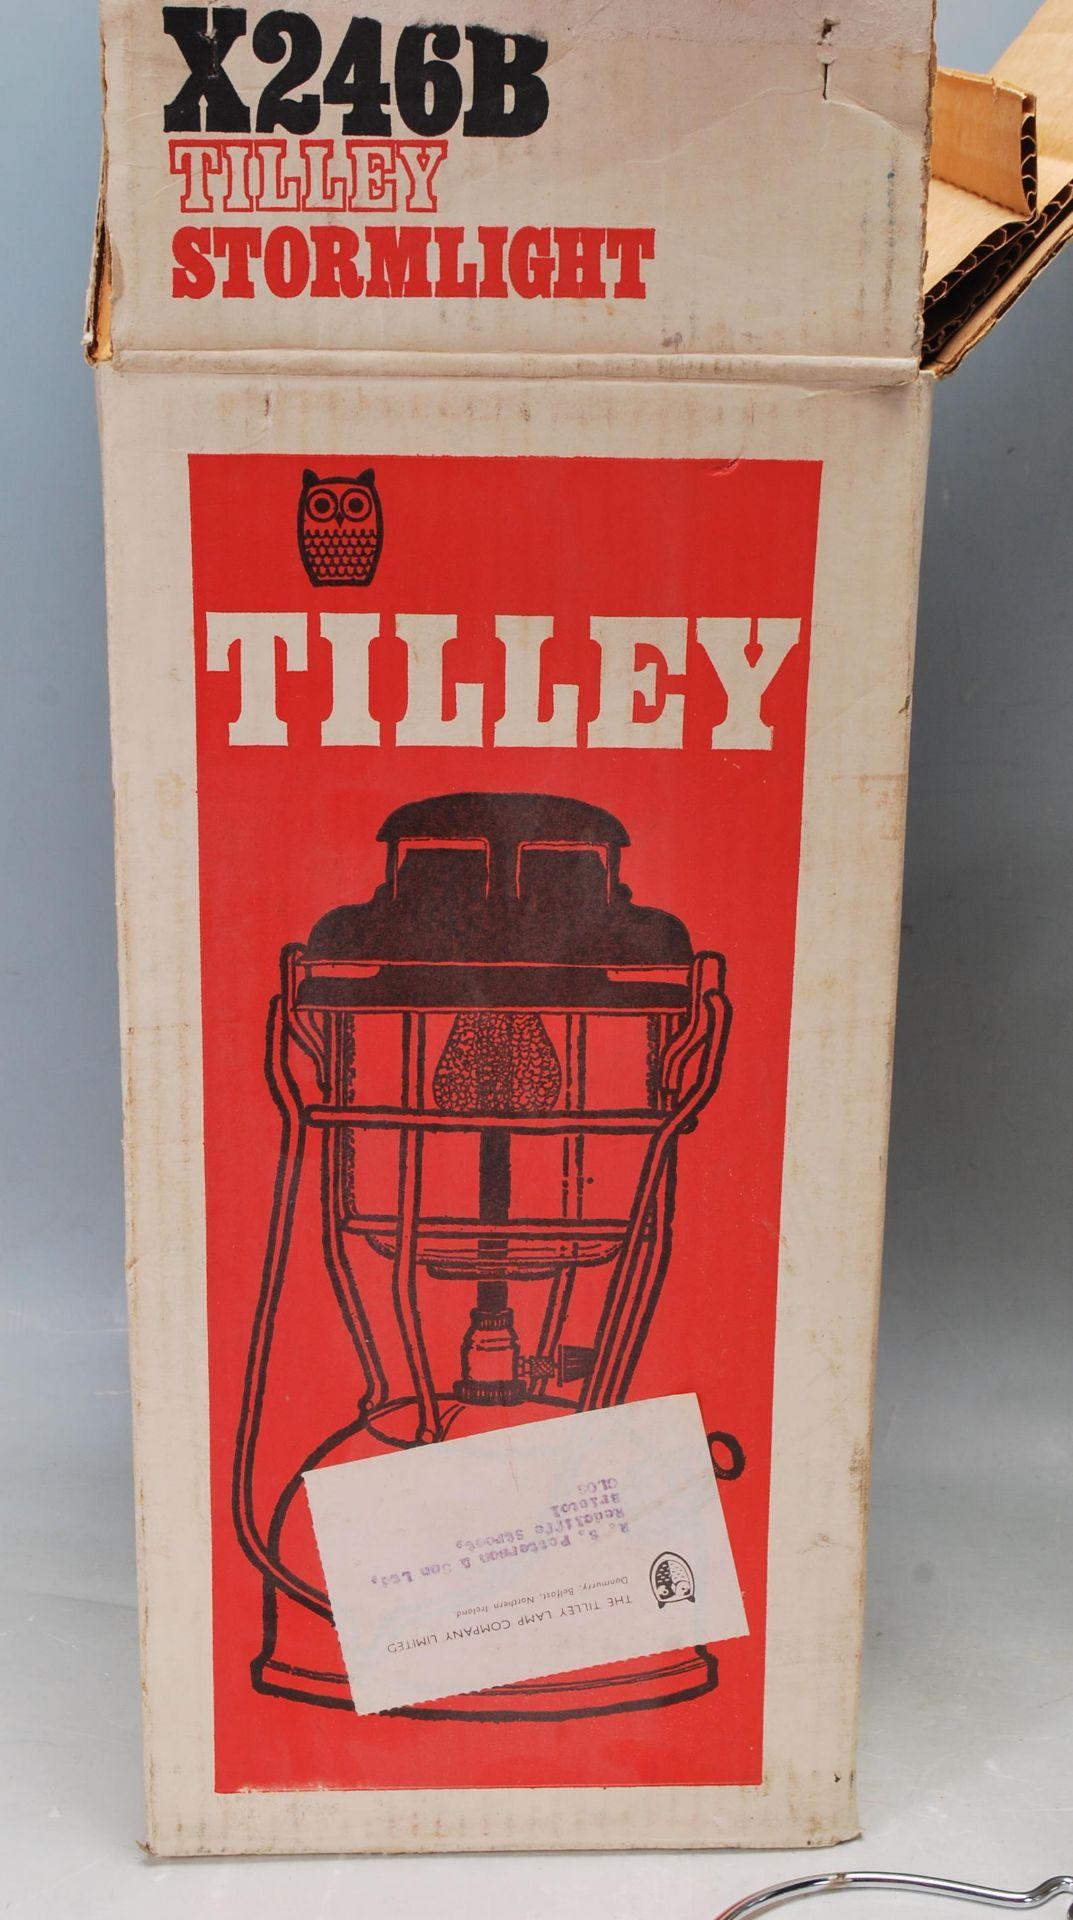 VINTAGE TILLEY STORMLIGHT MODEL X246B PARAFFIN LAMP - Image 7 of 7